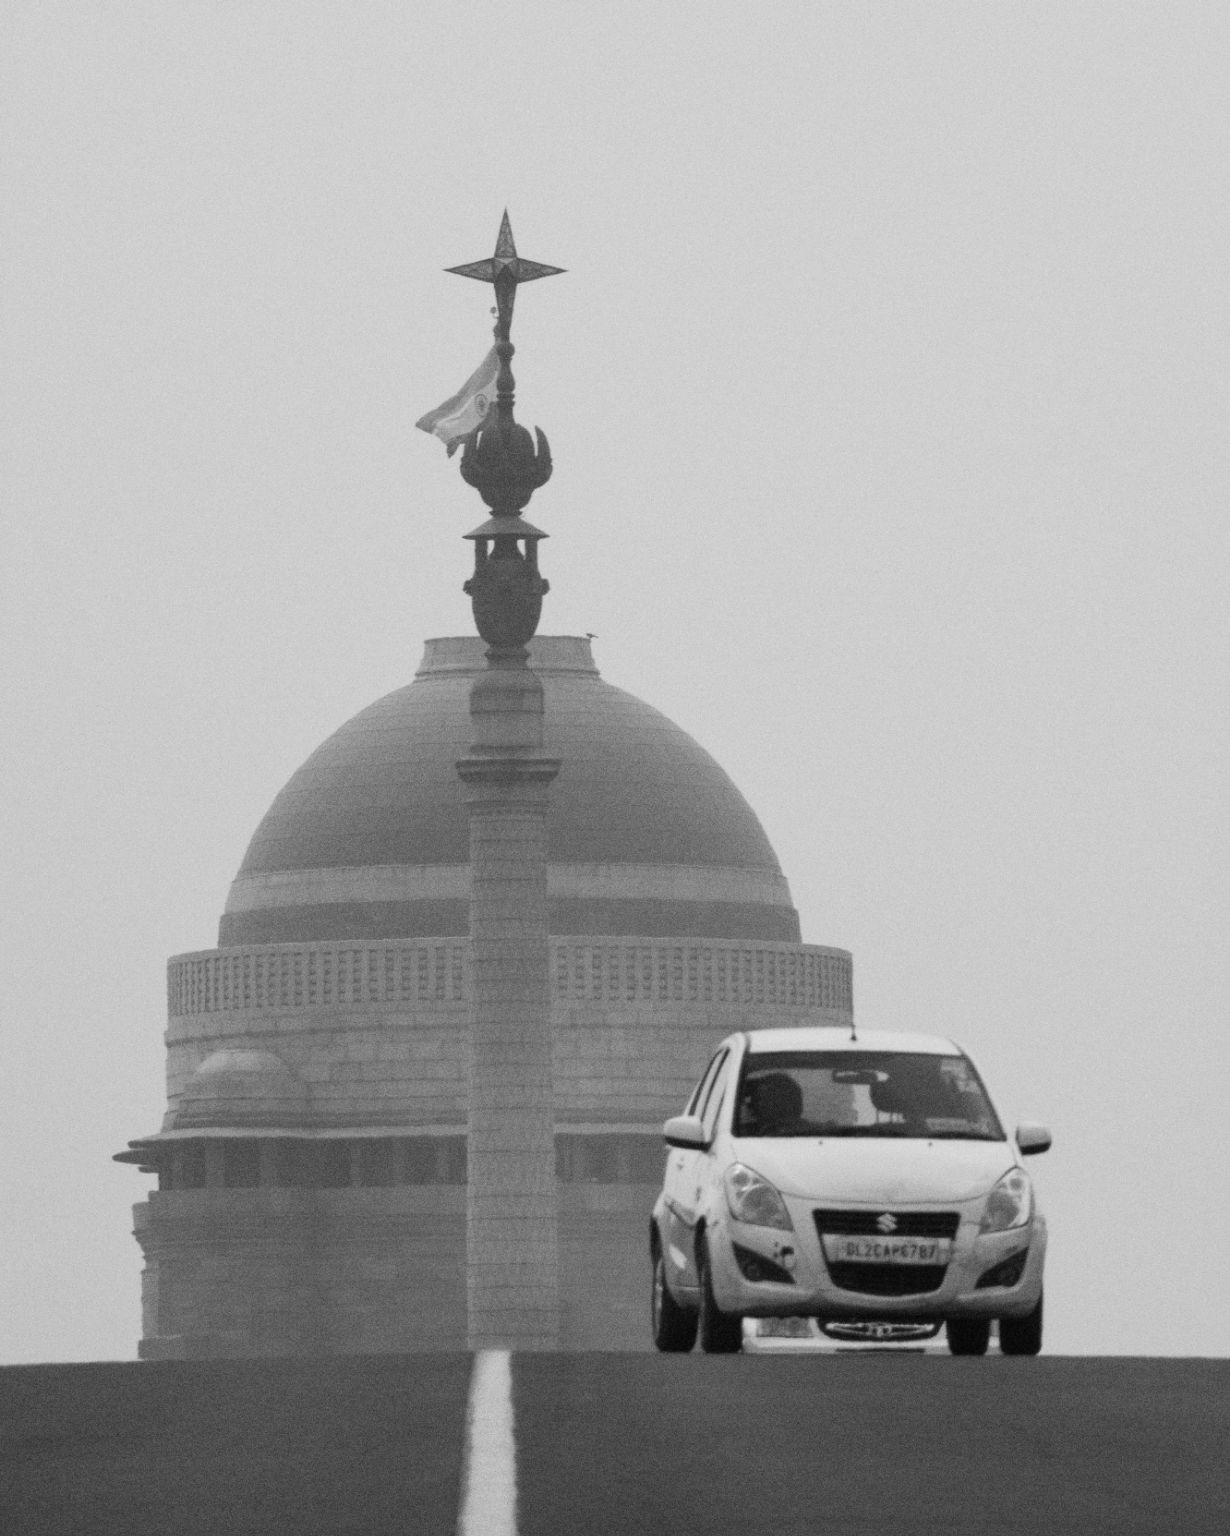 Photo of Rashtrapati Bhawan By sachin chauhan